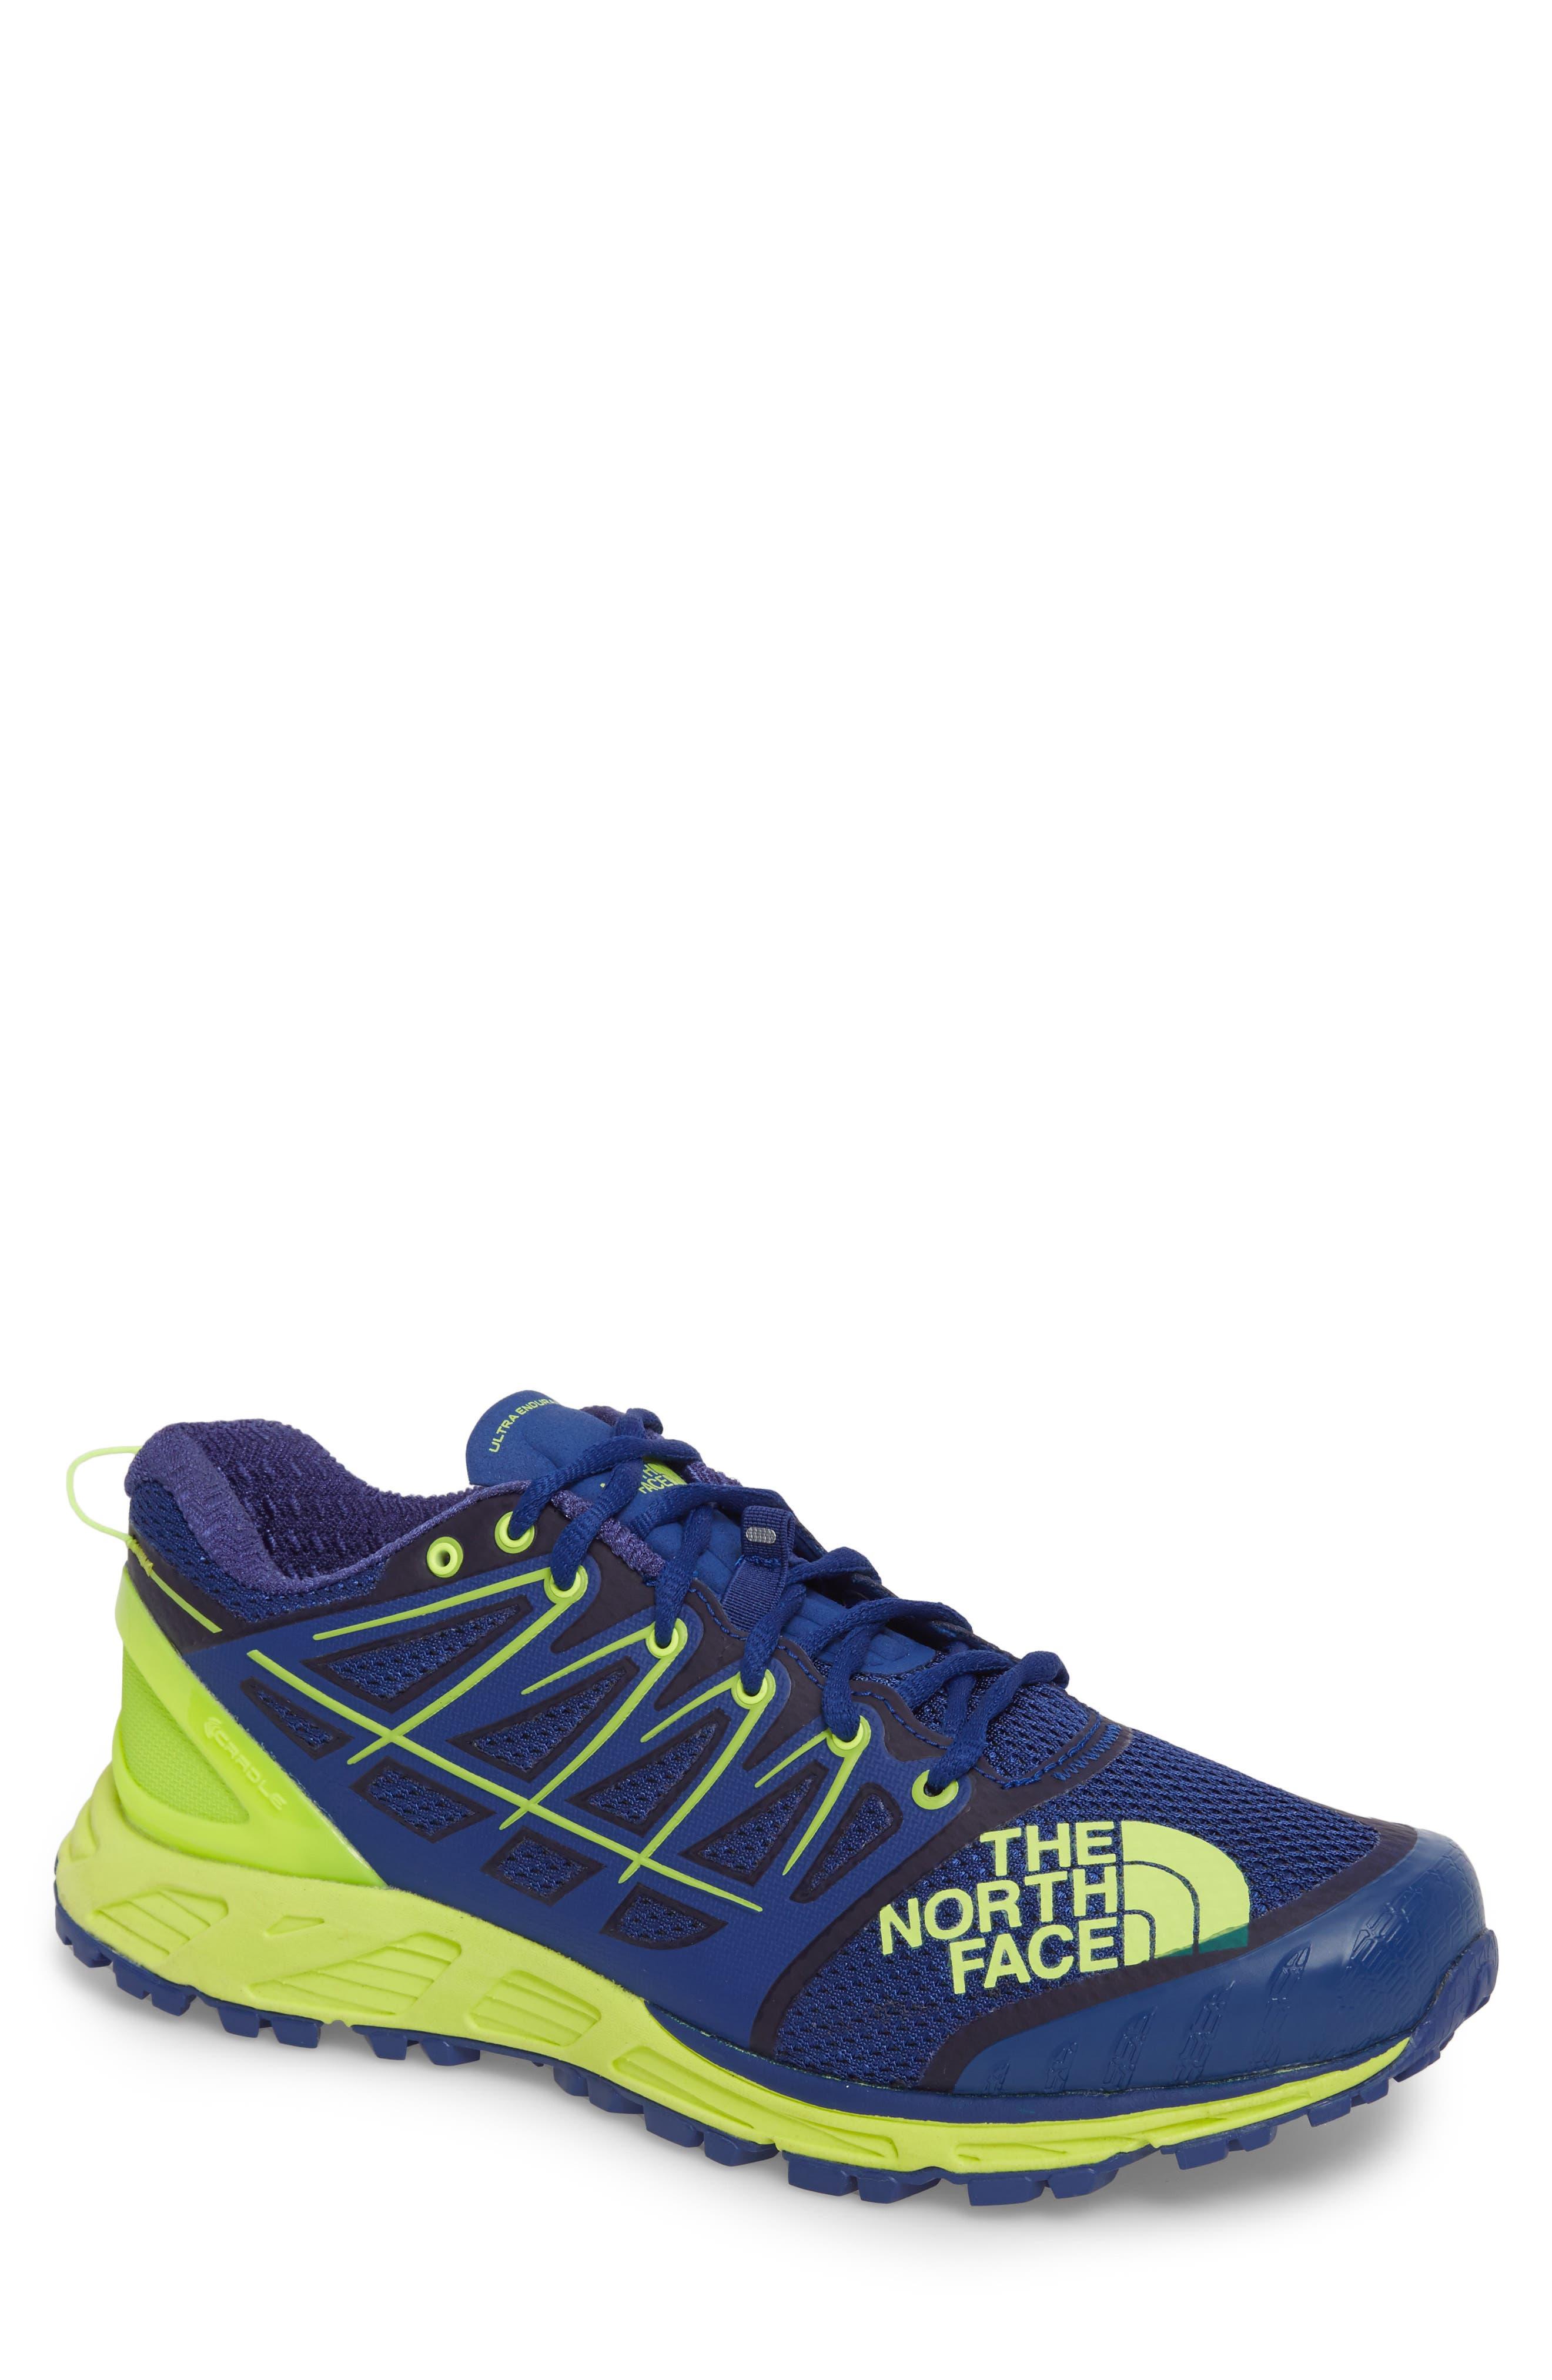 Ultra Endurance II Trail Running Shoe,                             Main thumbnail 1, color,                             Brit Blue/ Dayglo Yellow